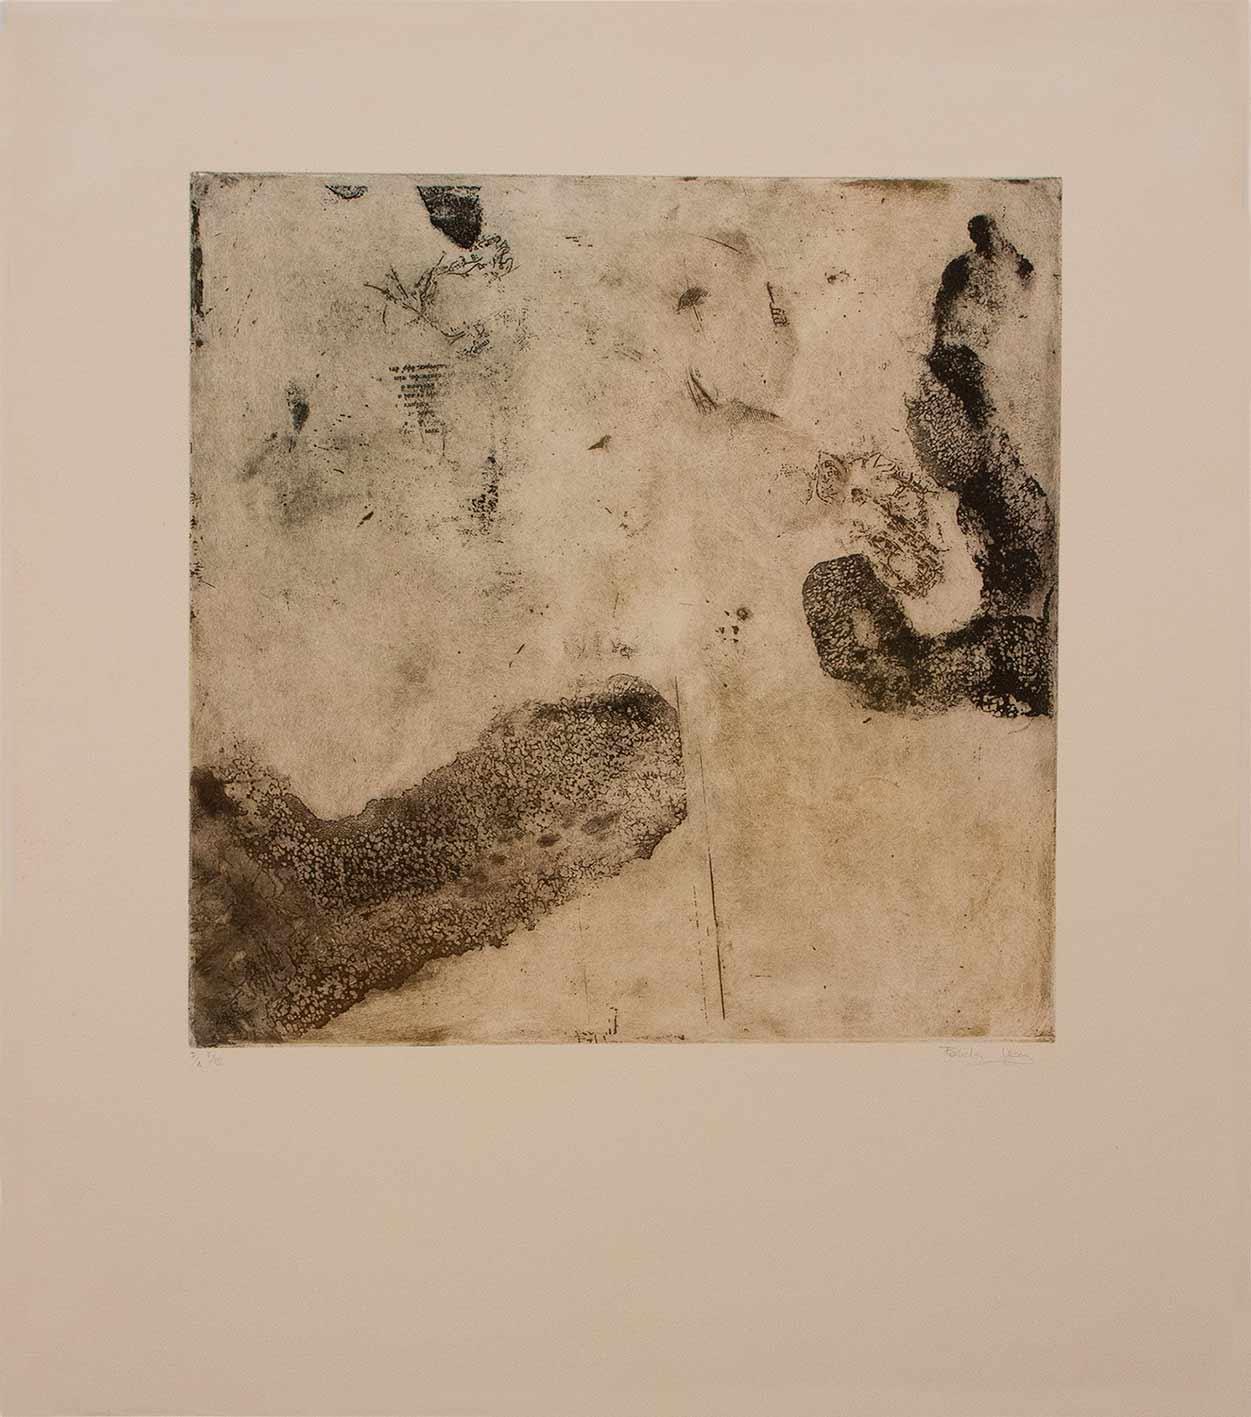 Serie Odisea - Grabado Calcográfico - Fabiola Ubani